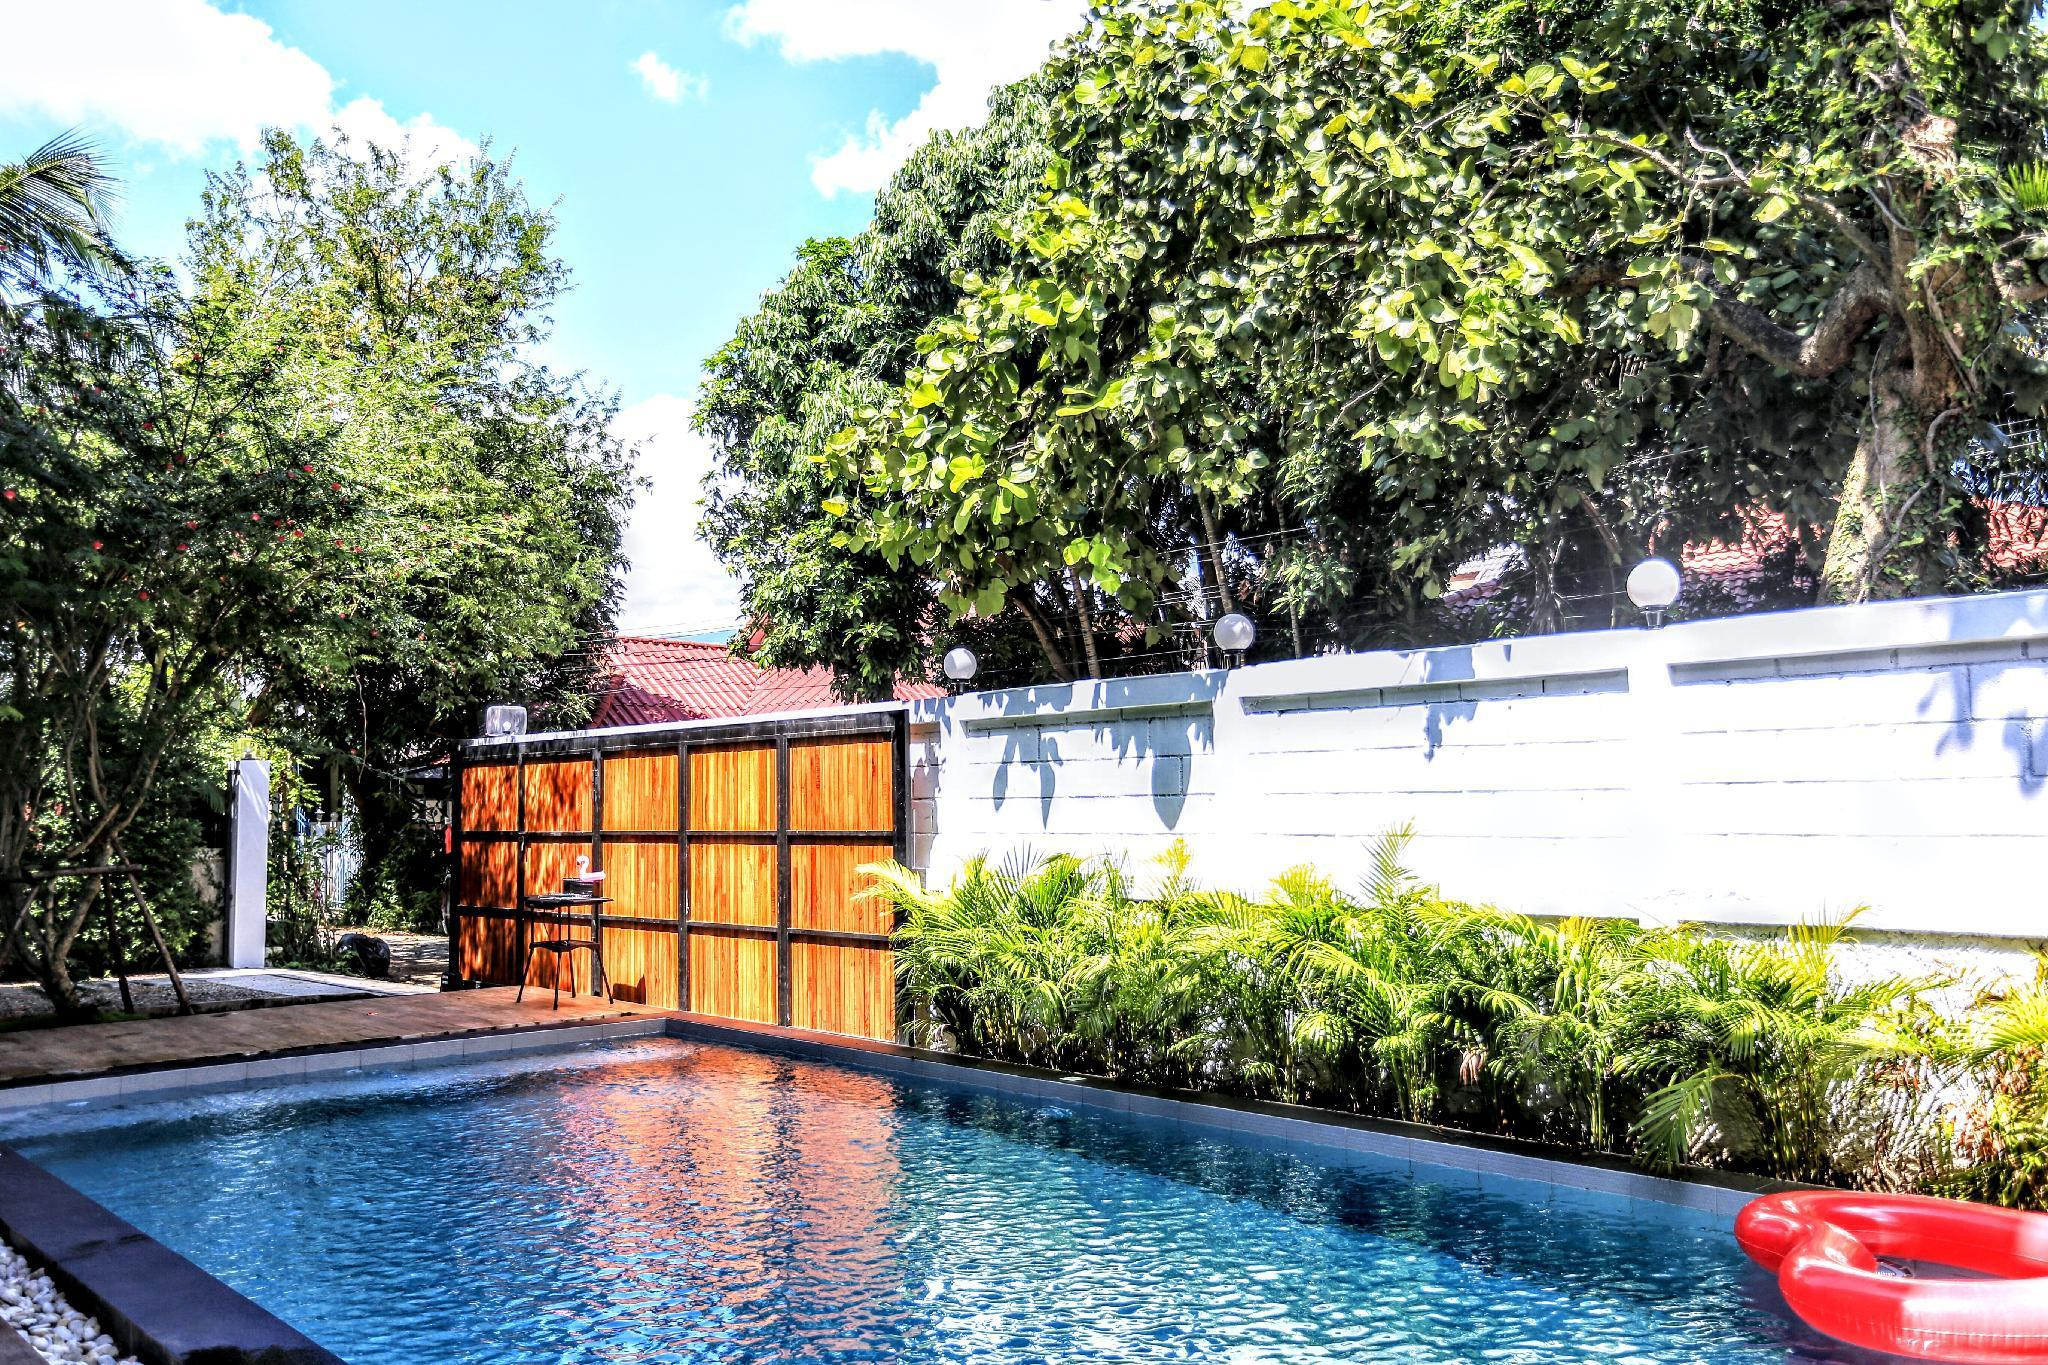 Luxury Pool Villa for families /Quiet surroundings วิลลา 6 ห้องนอน 7 ห้องน้ำส่วนตัว ขนาด 500 ตร.ม. – สนามบินเชียงใหม่